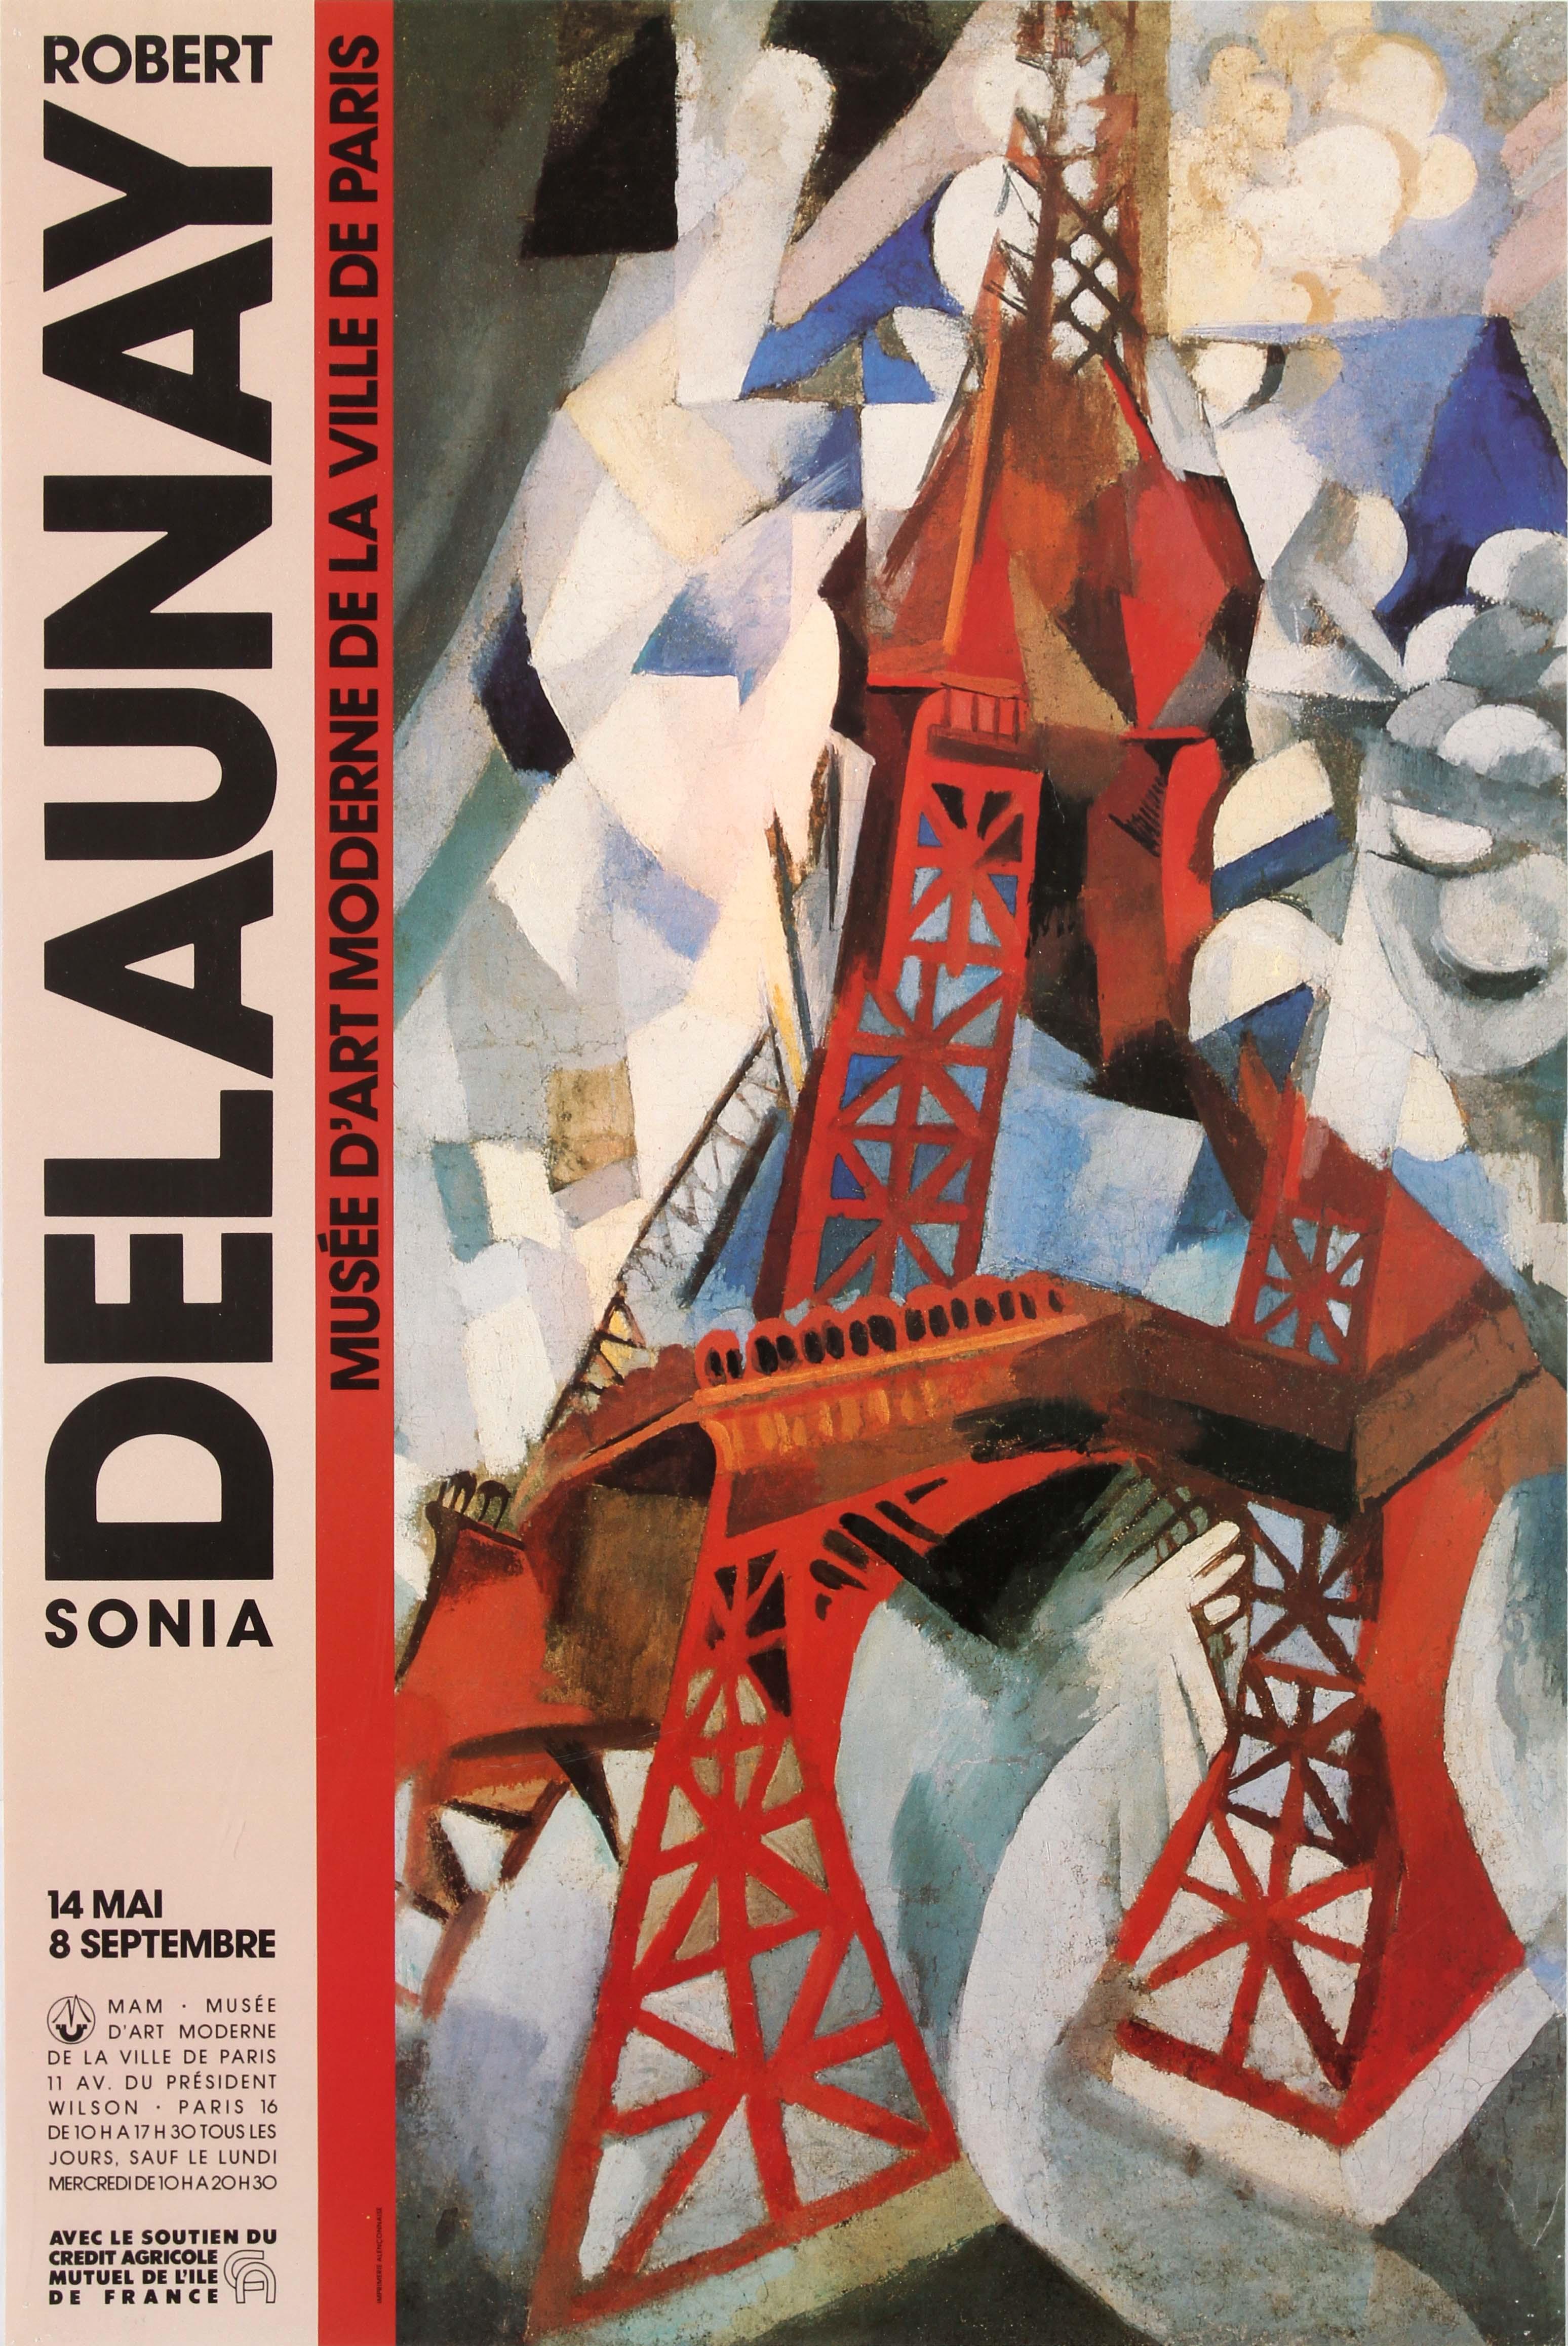 Lot 1804 - Advertising Poster Robert & Sonia Delaunay Exhibition Museum of Modern Art of Paris